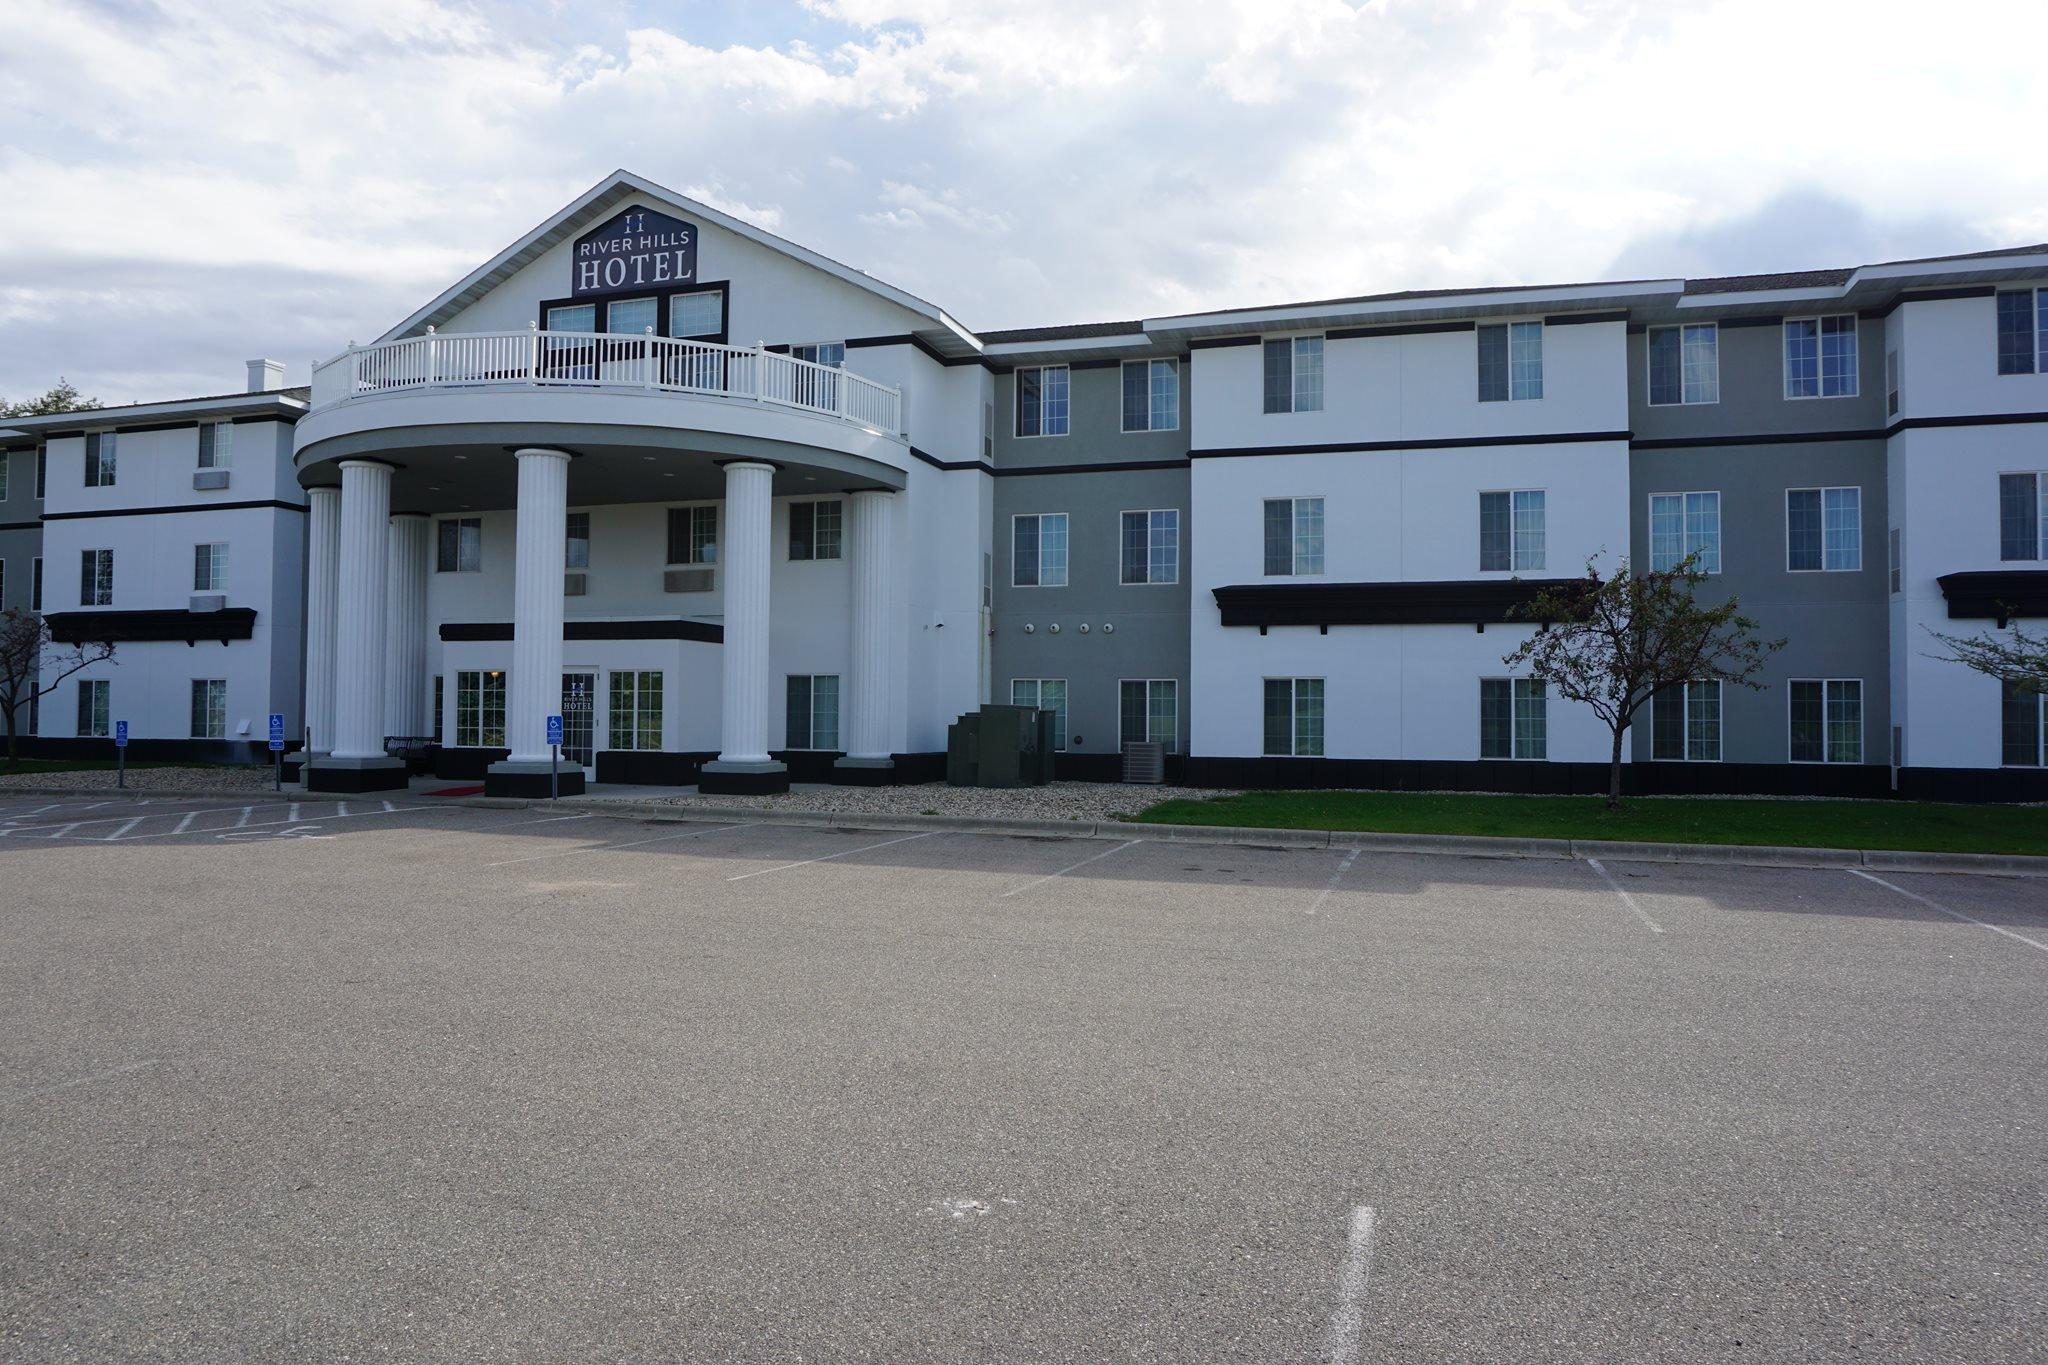 River Hills Hotel & Suites